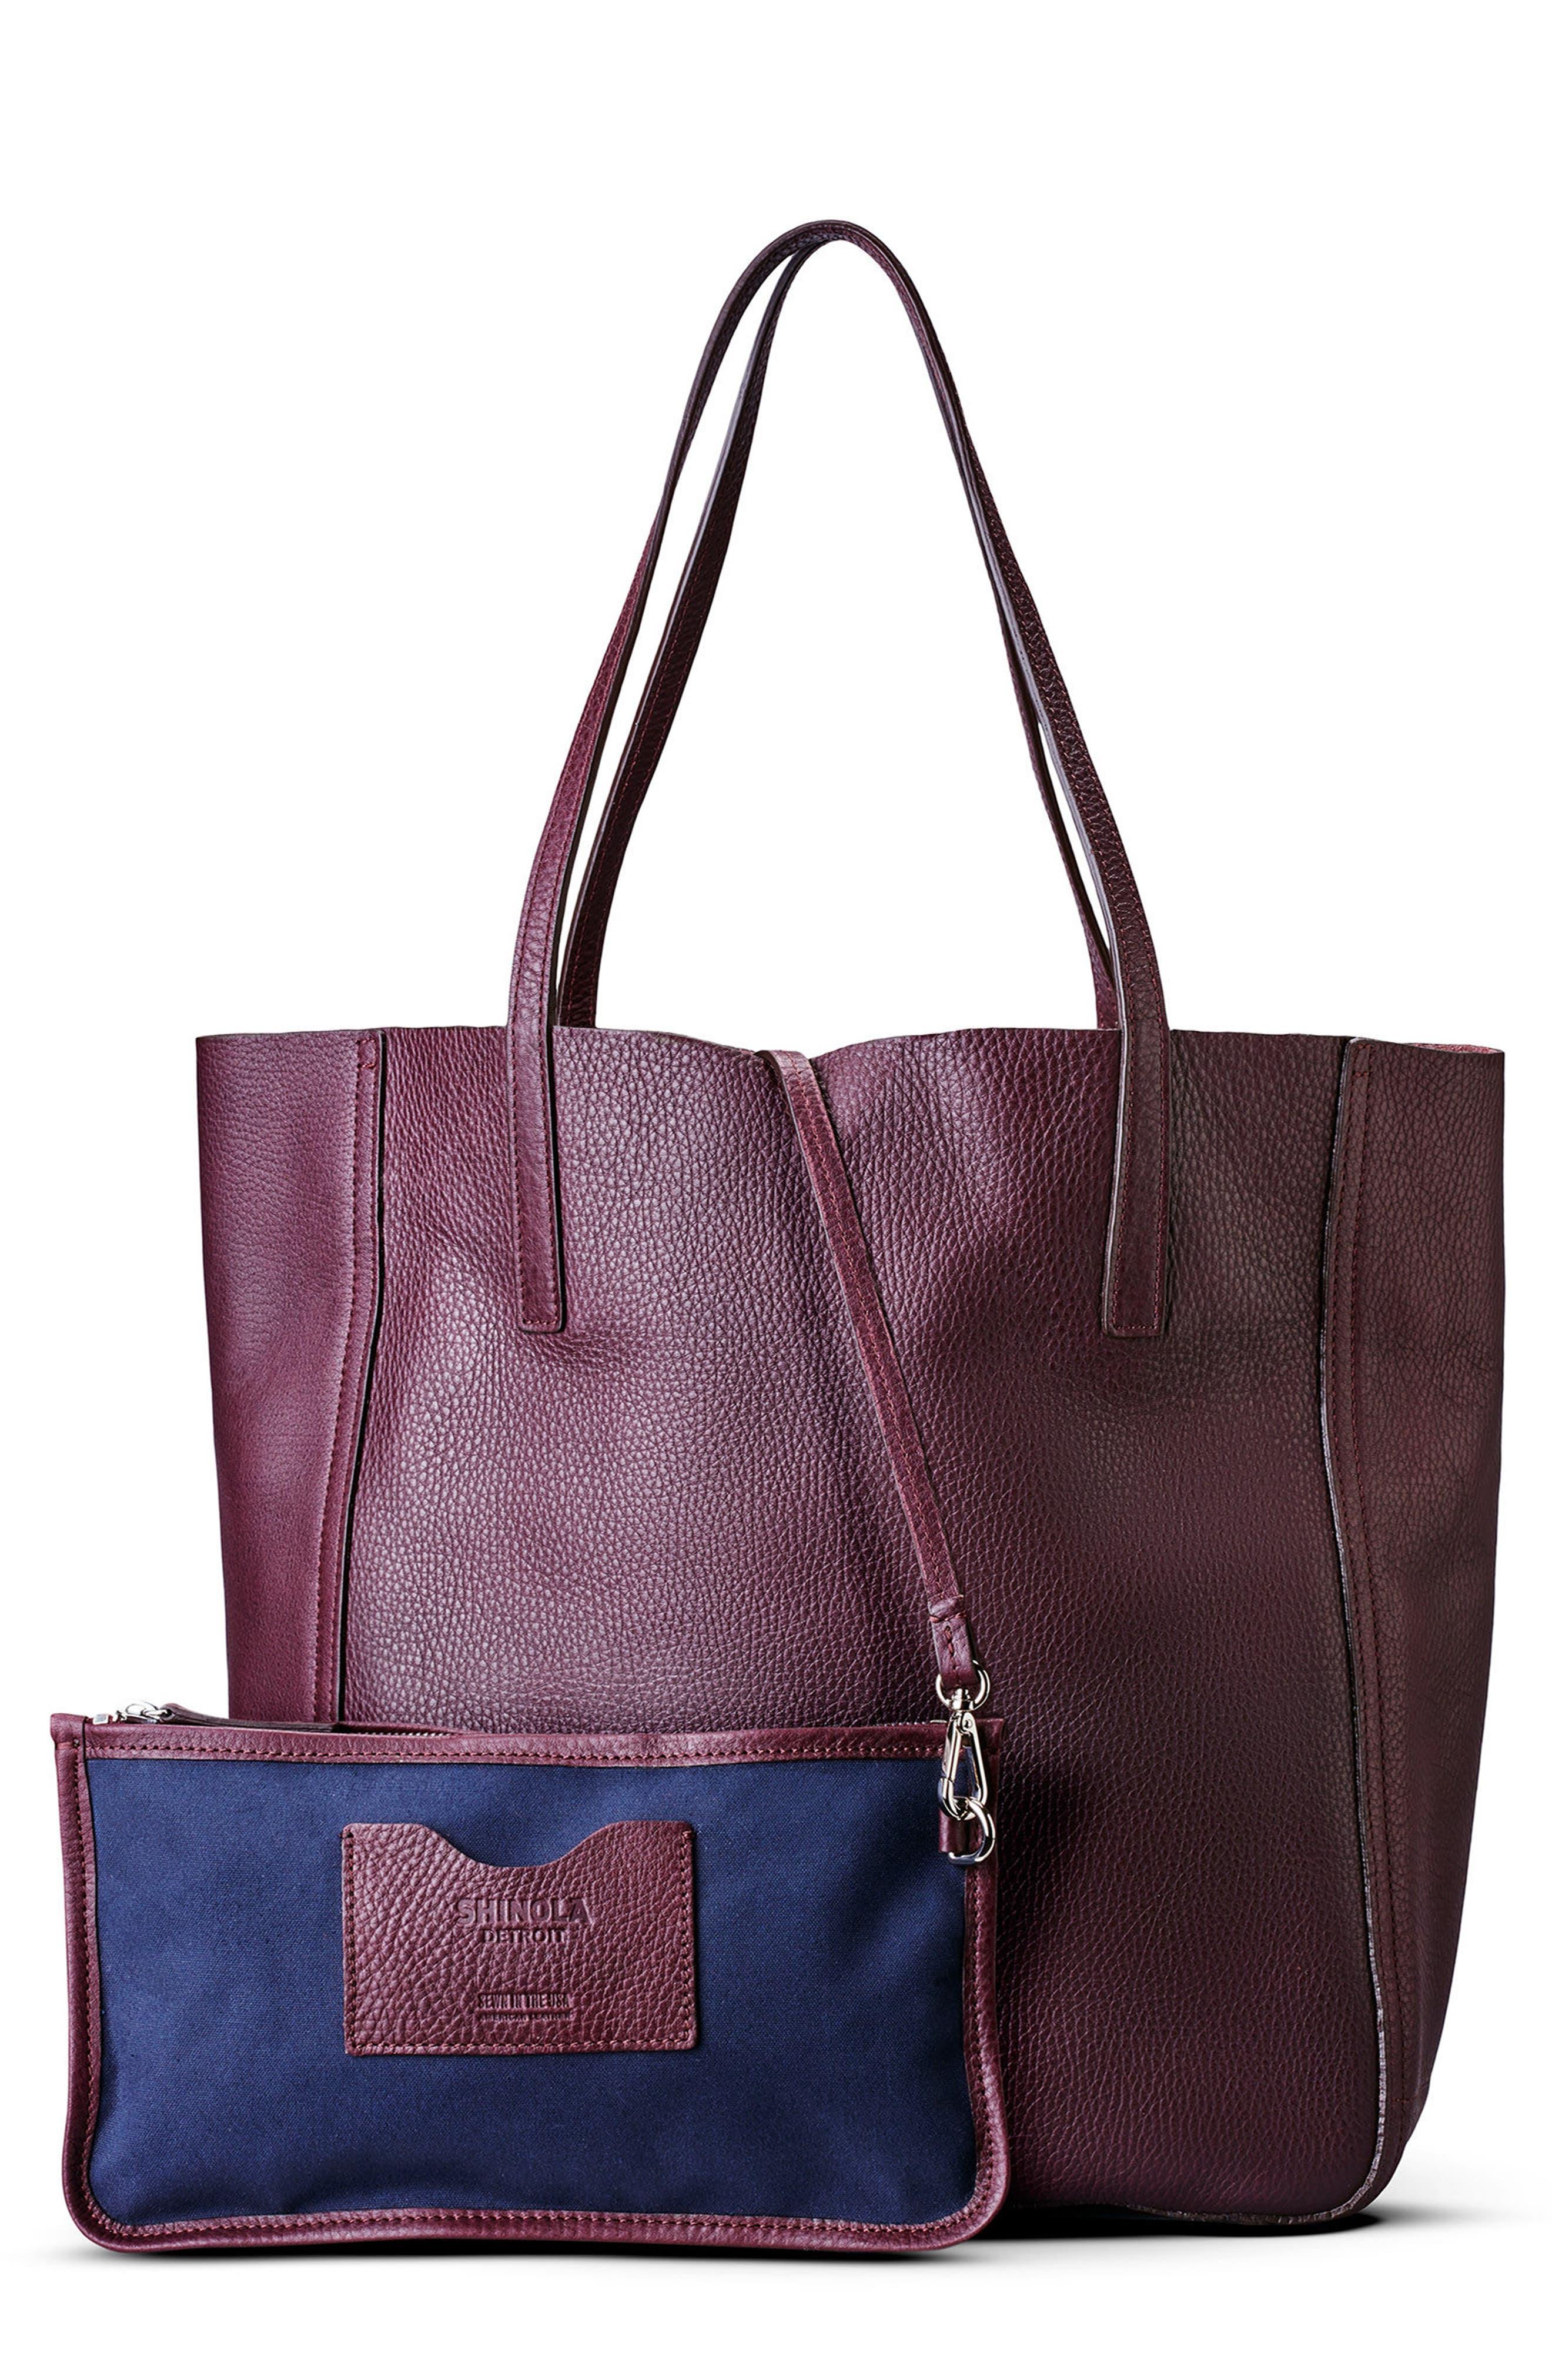 Main Image - Shinola Medium Leather Shopper (Nordstrom Exclusive)